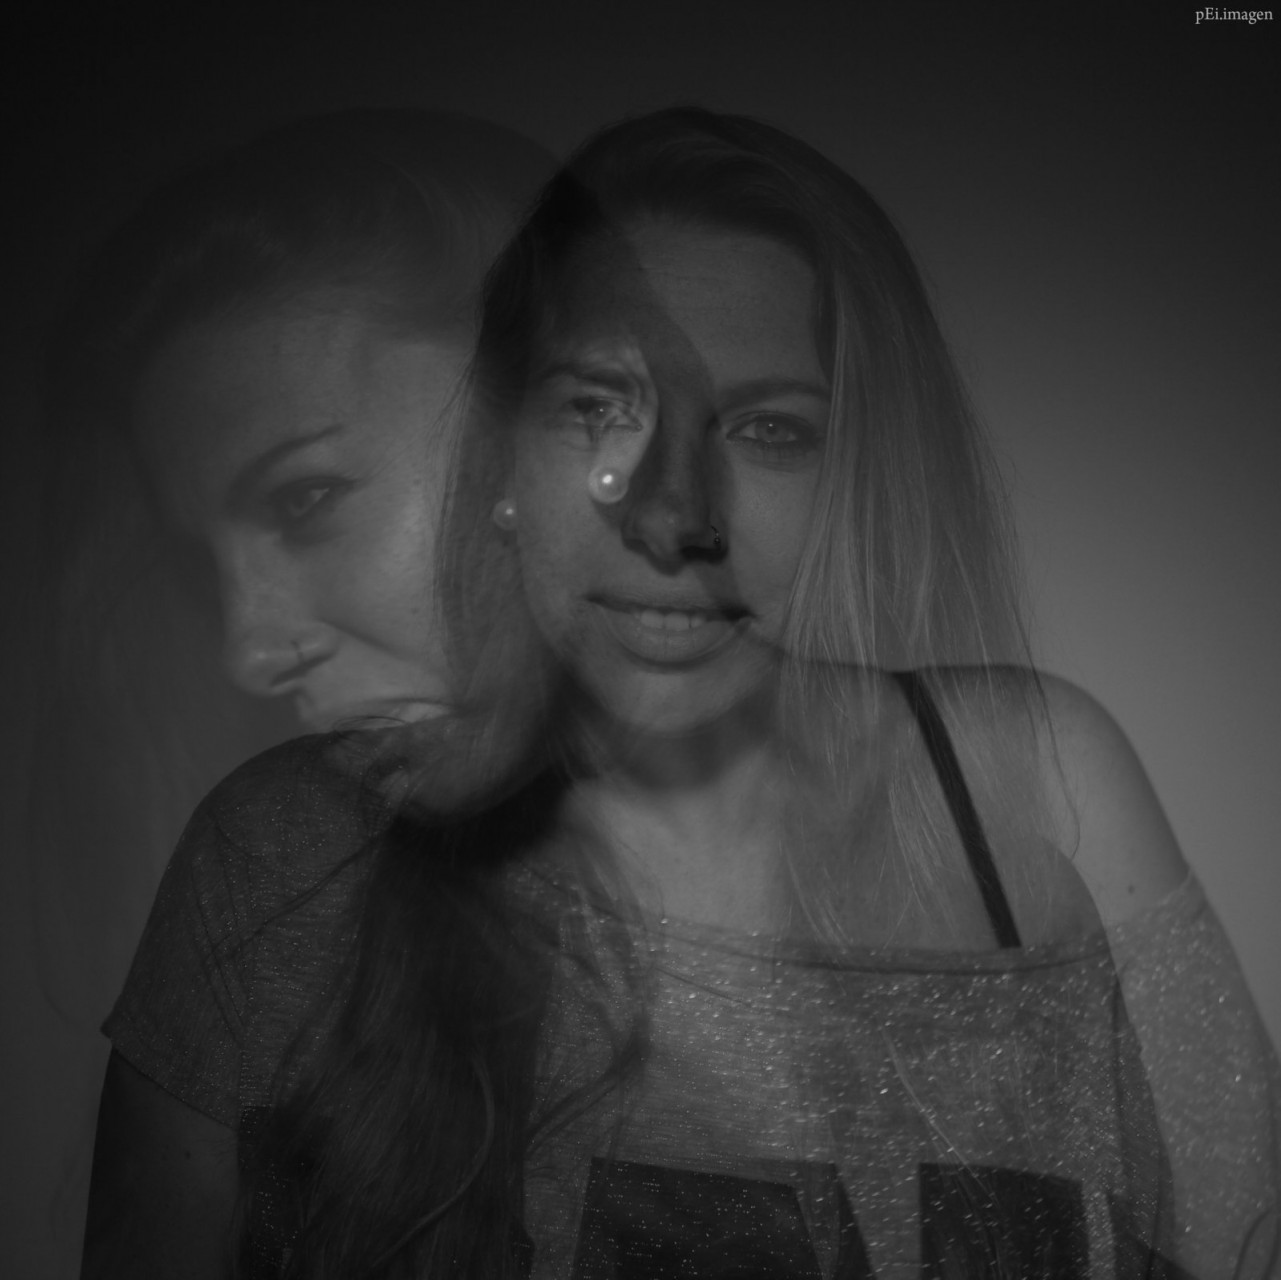 peipegata me myself I proyectos fotografia peipegatafotografia # 091 Andrea Gomez